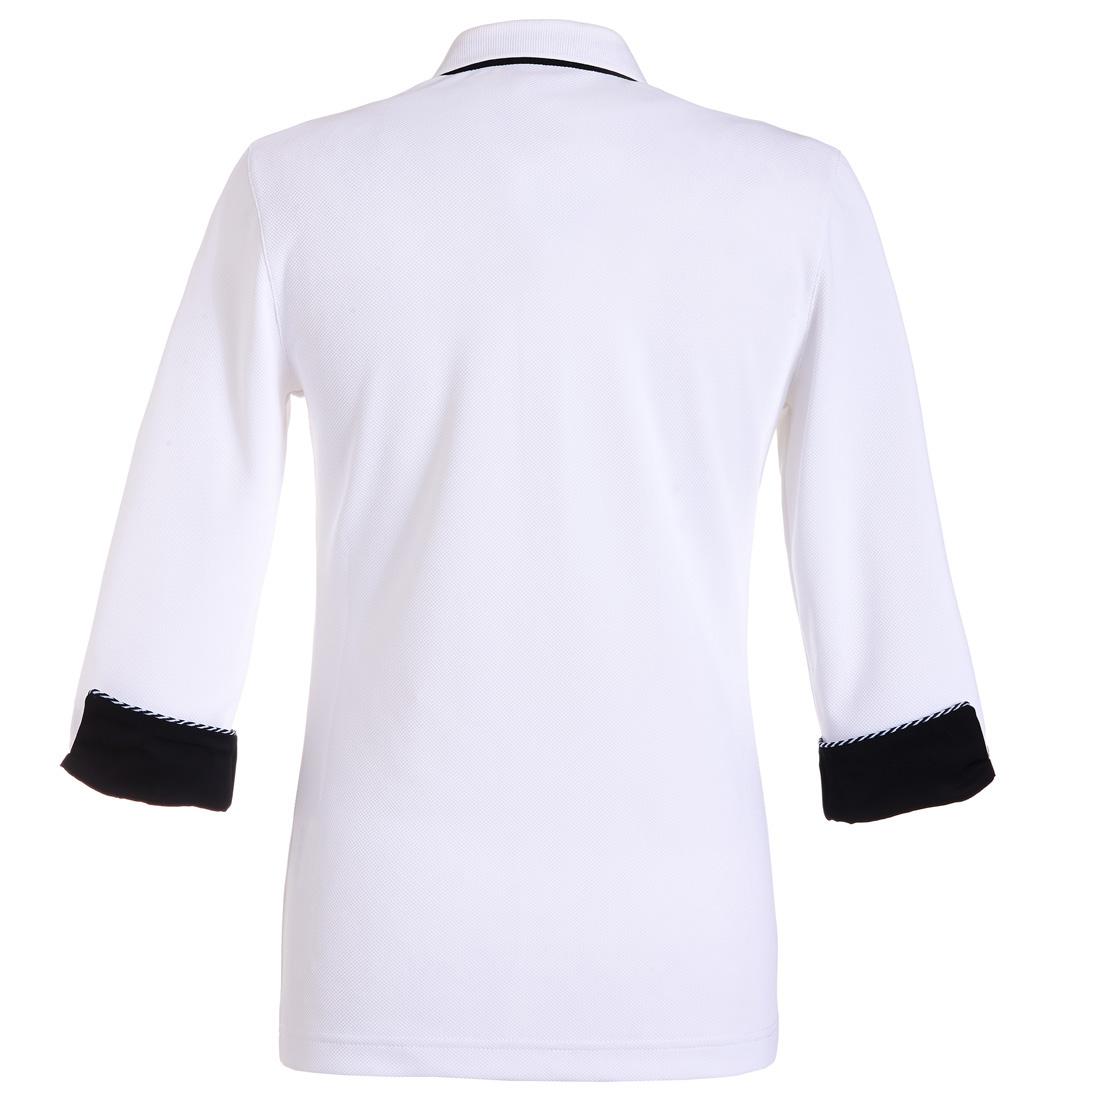 Dry Comfort Poloshirt mit 3/4 Arm Weiß